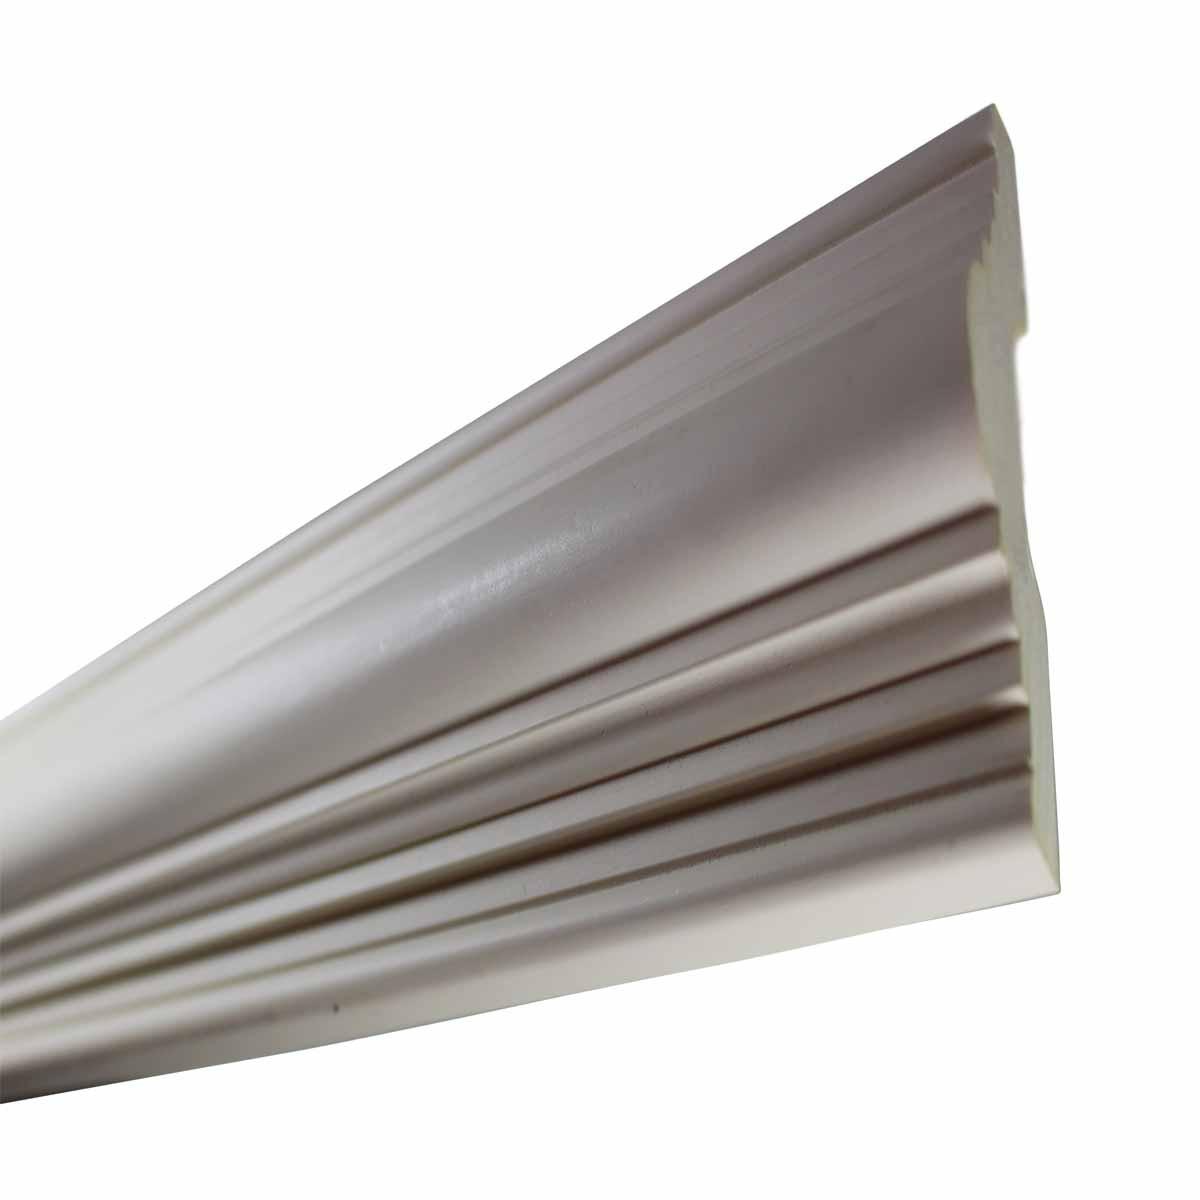 Cornice White Urethane Sample of 11532 23.75  Long Cornice Cornice Moulding Cornice Molding